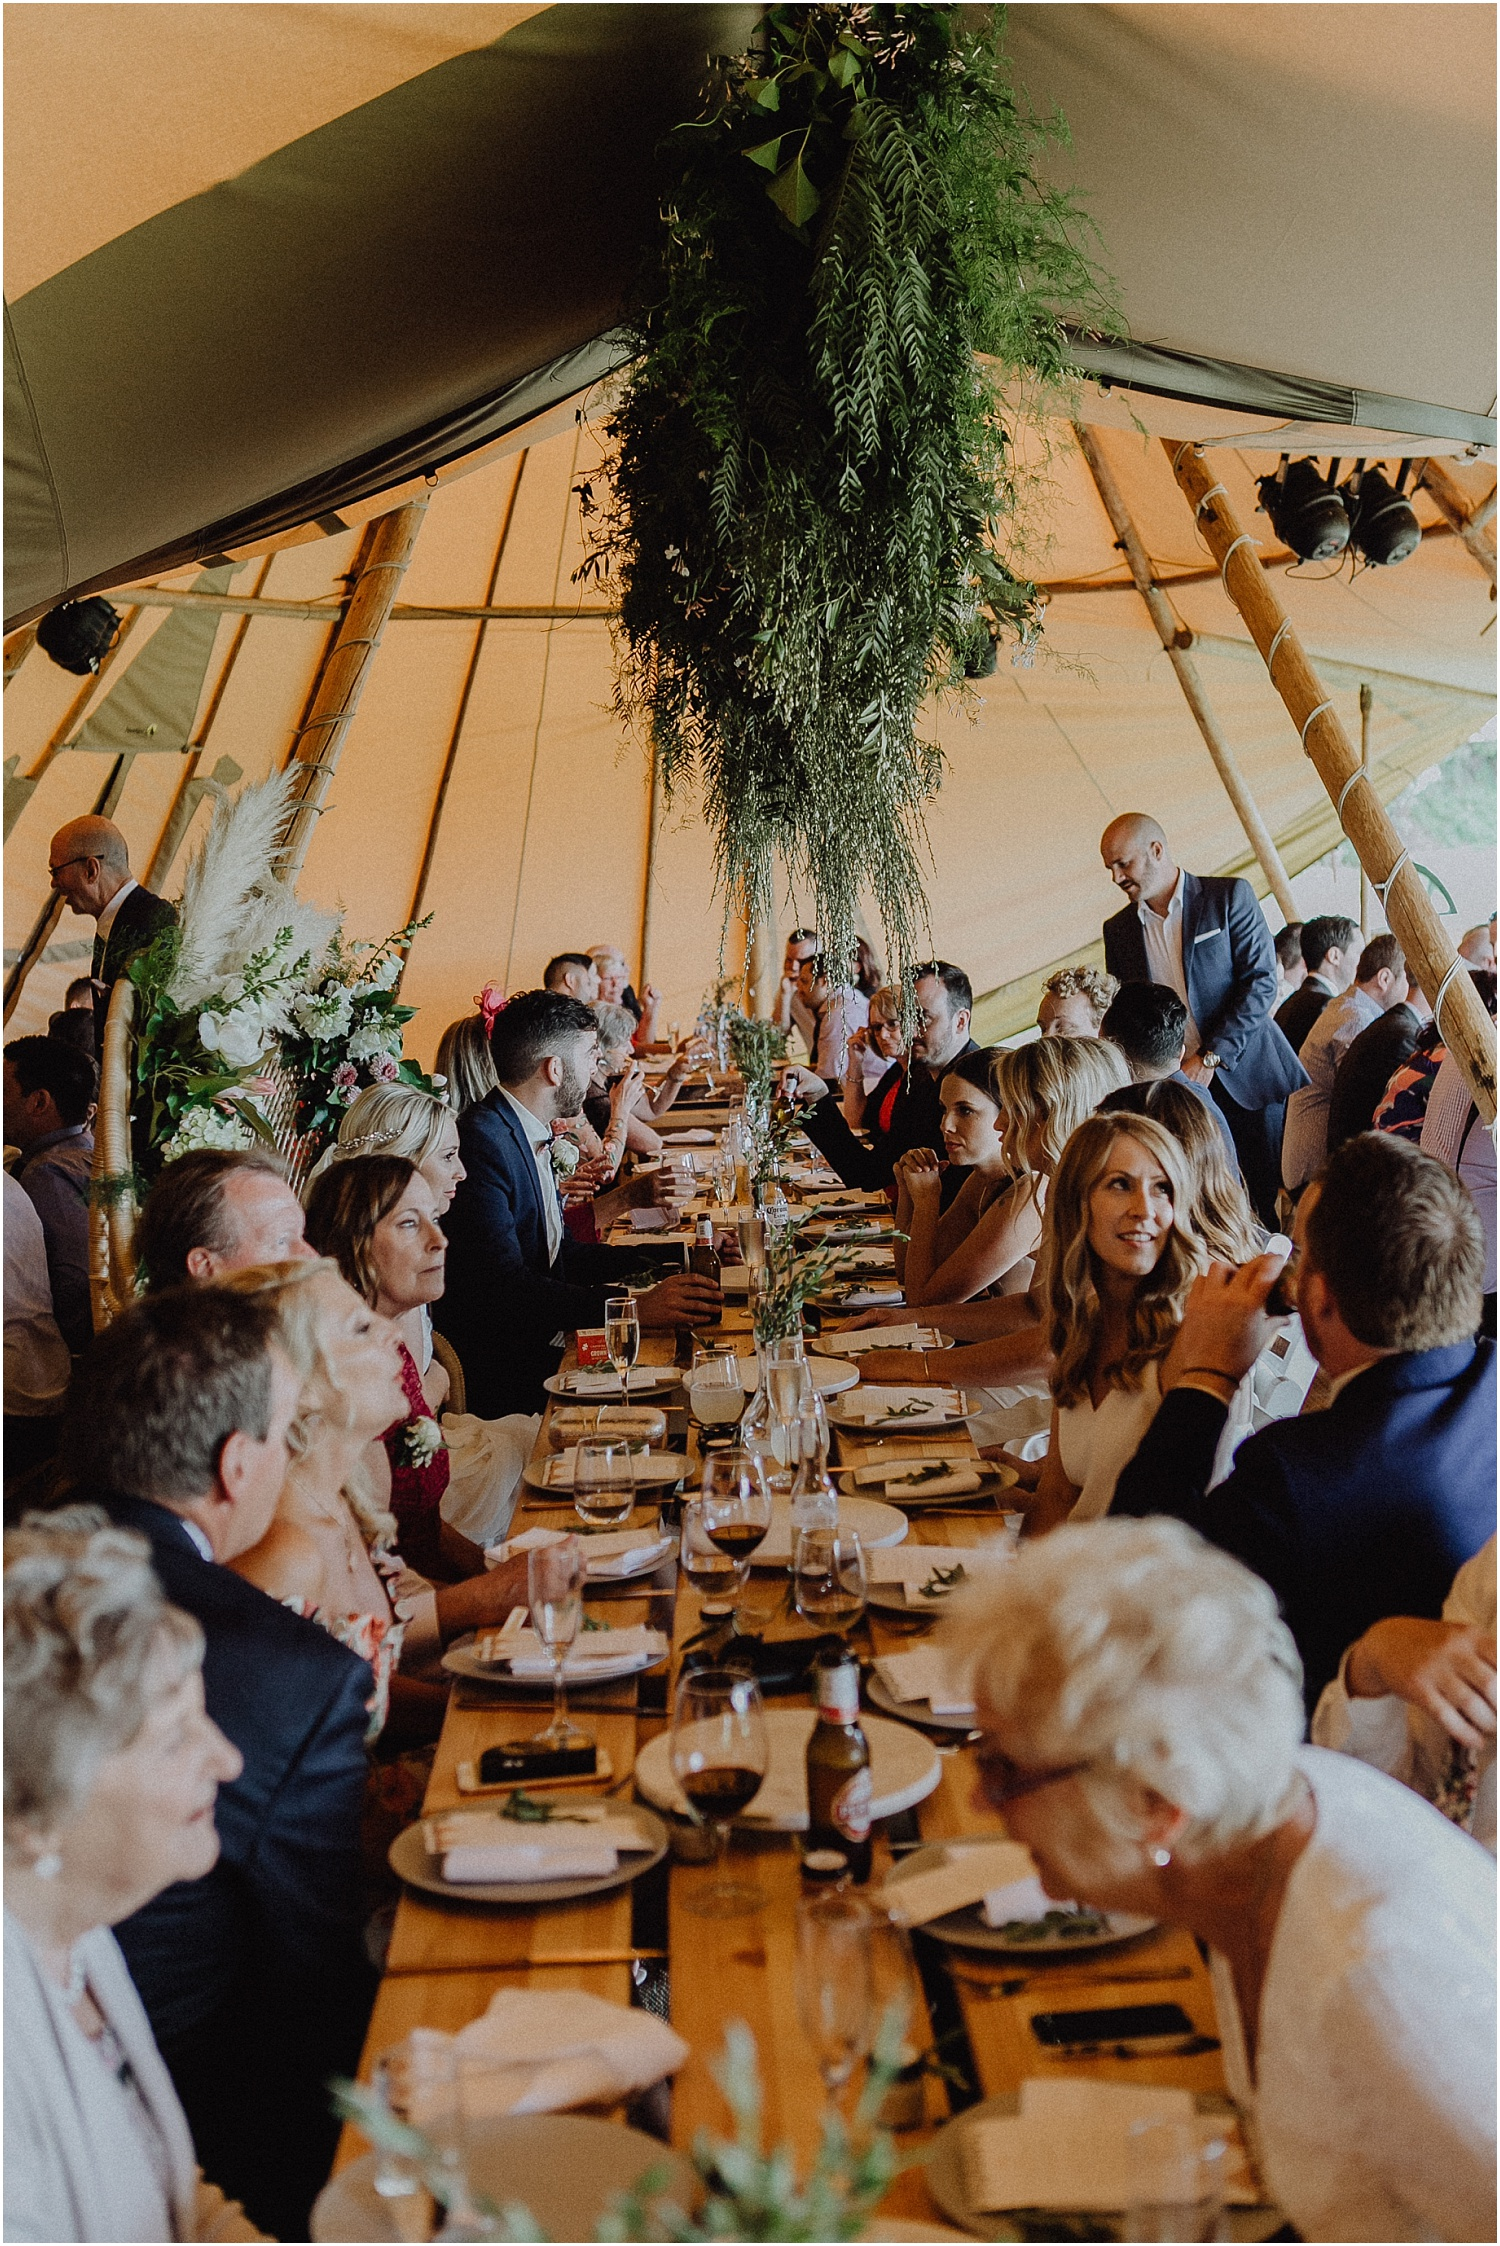 Nicolle and Damien's tipi wedding at the Flinders Yacht Club on the Mornington Peninsula._0164.jpg